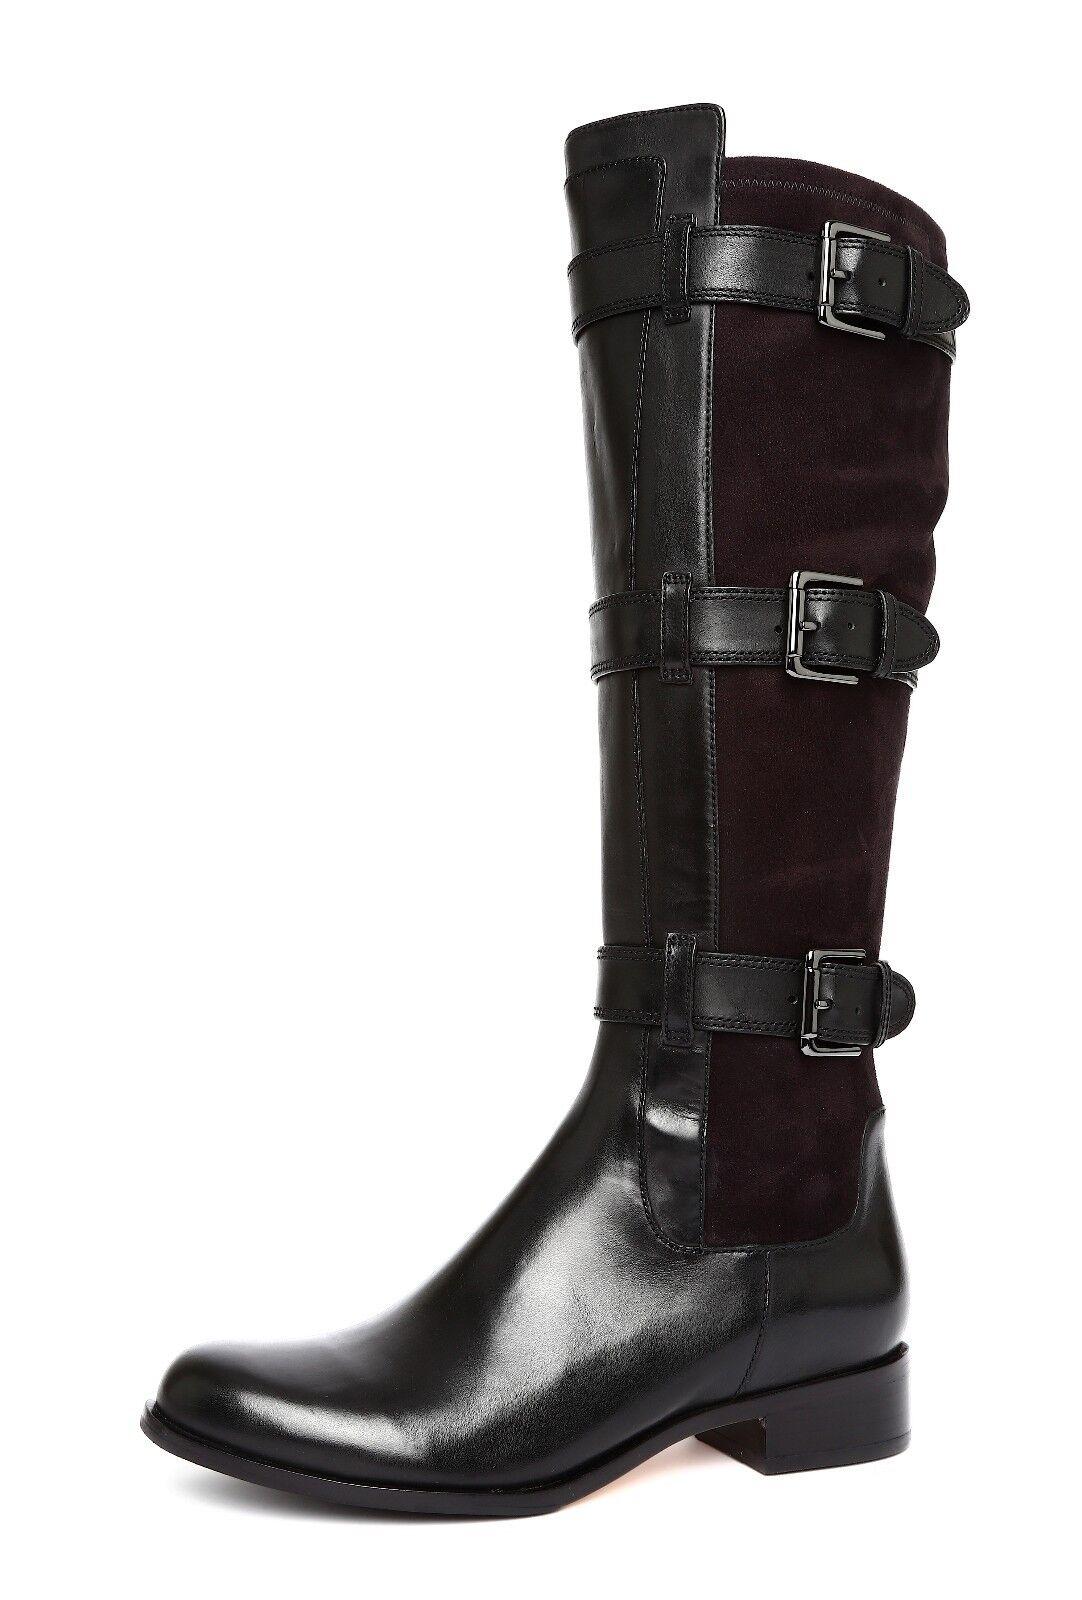 Cole Haan Women's Black Avalon Tall Boots Sz 7.5 B 2100